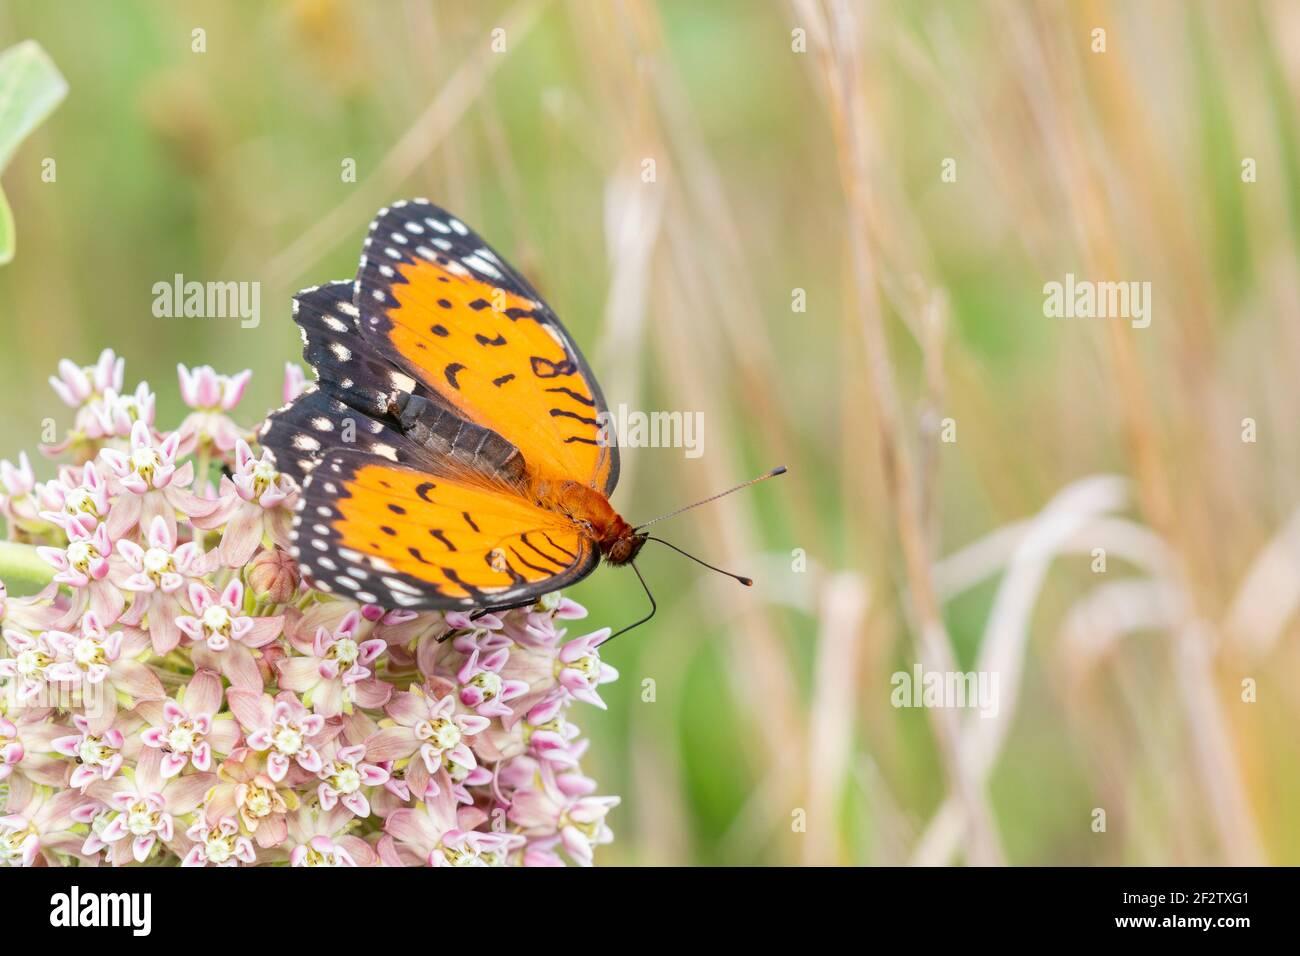 03325-00503 Regal Fritillary (Speyeria idalia) Weibchen auf gemeiner Milchblume (Asclepias syriaca) Sand Prairie - Scrub Oak Nature Preserve Mason Co. IL Stockfoto